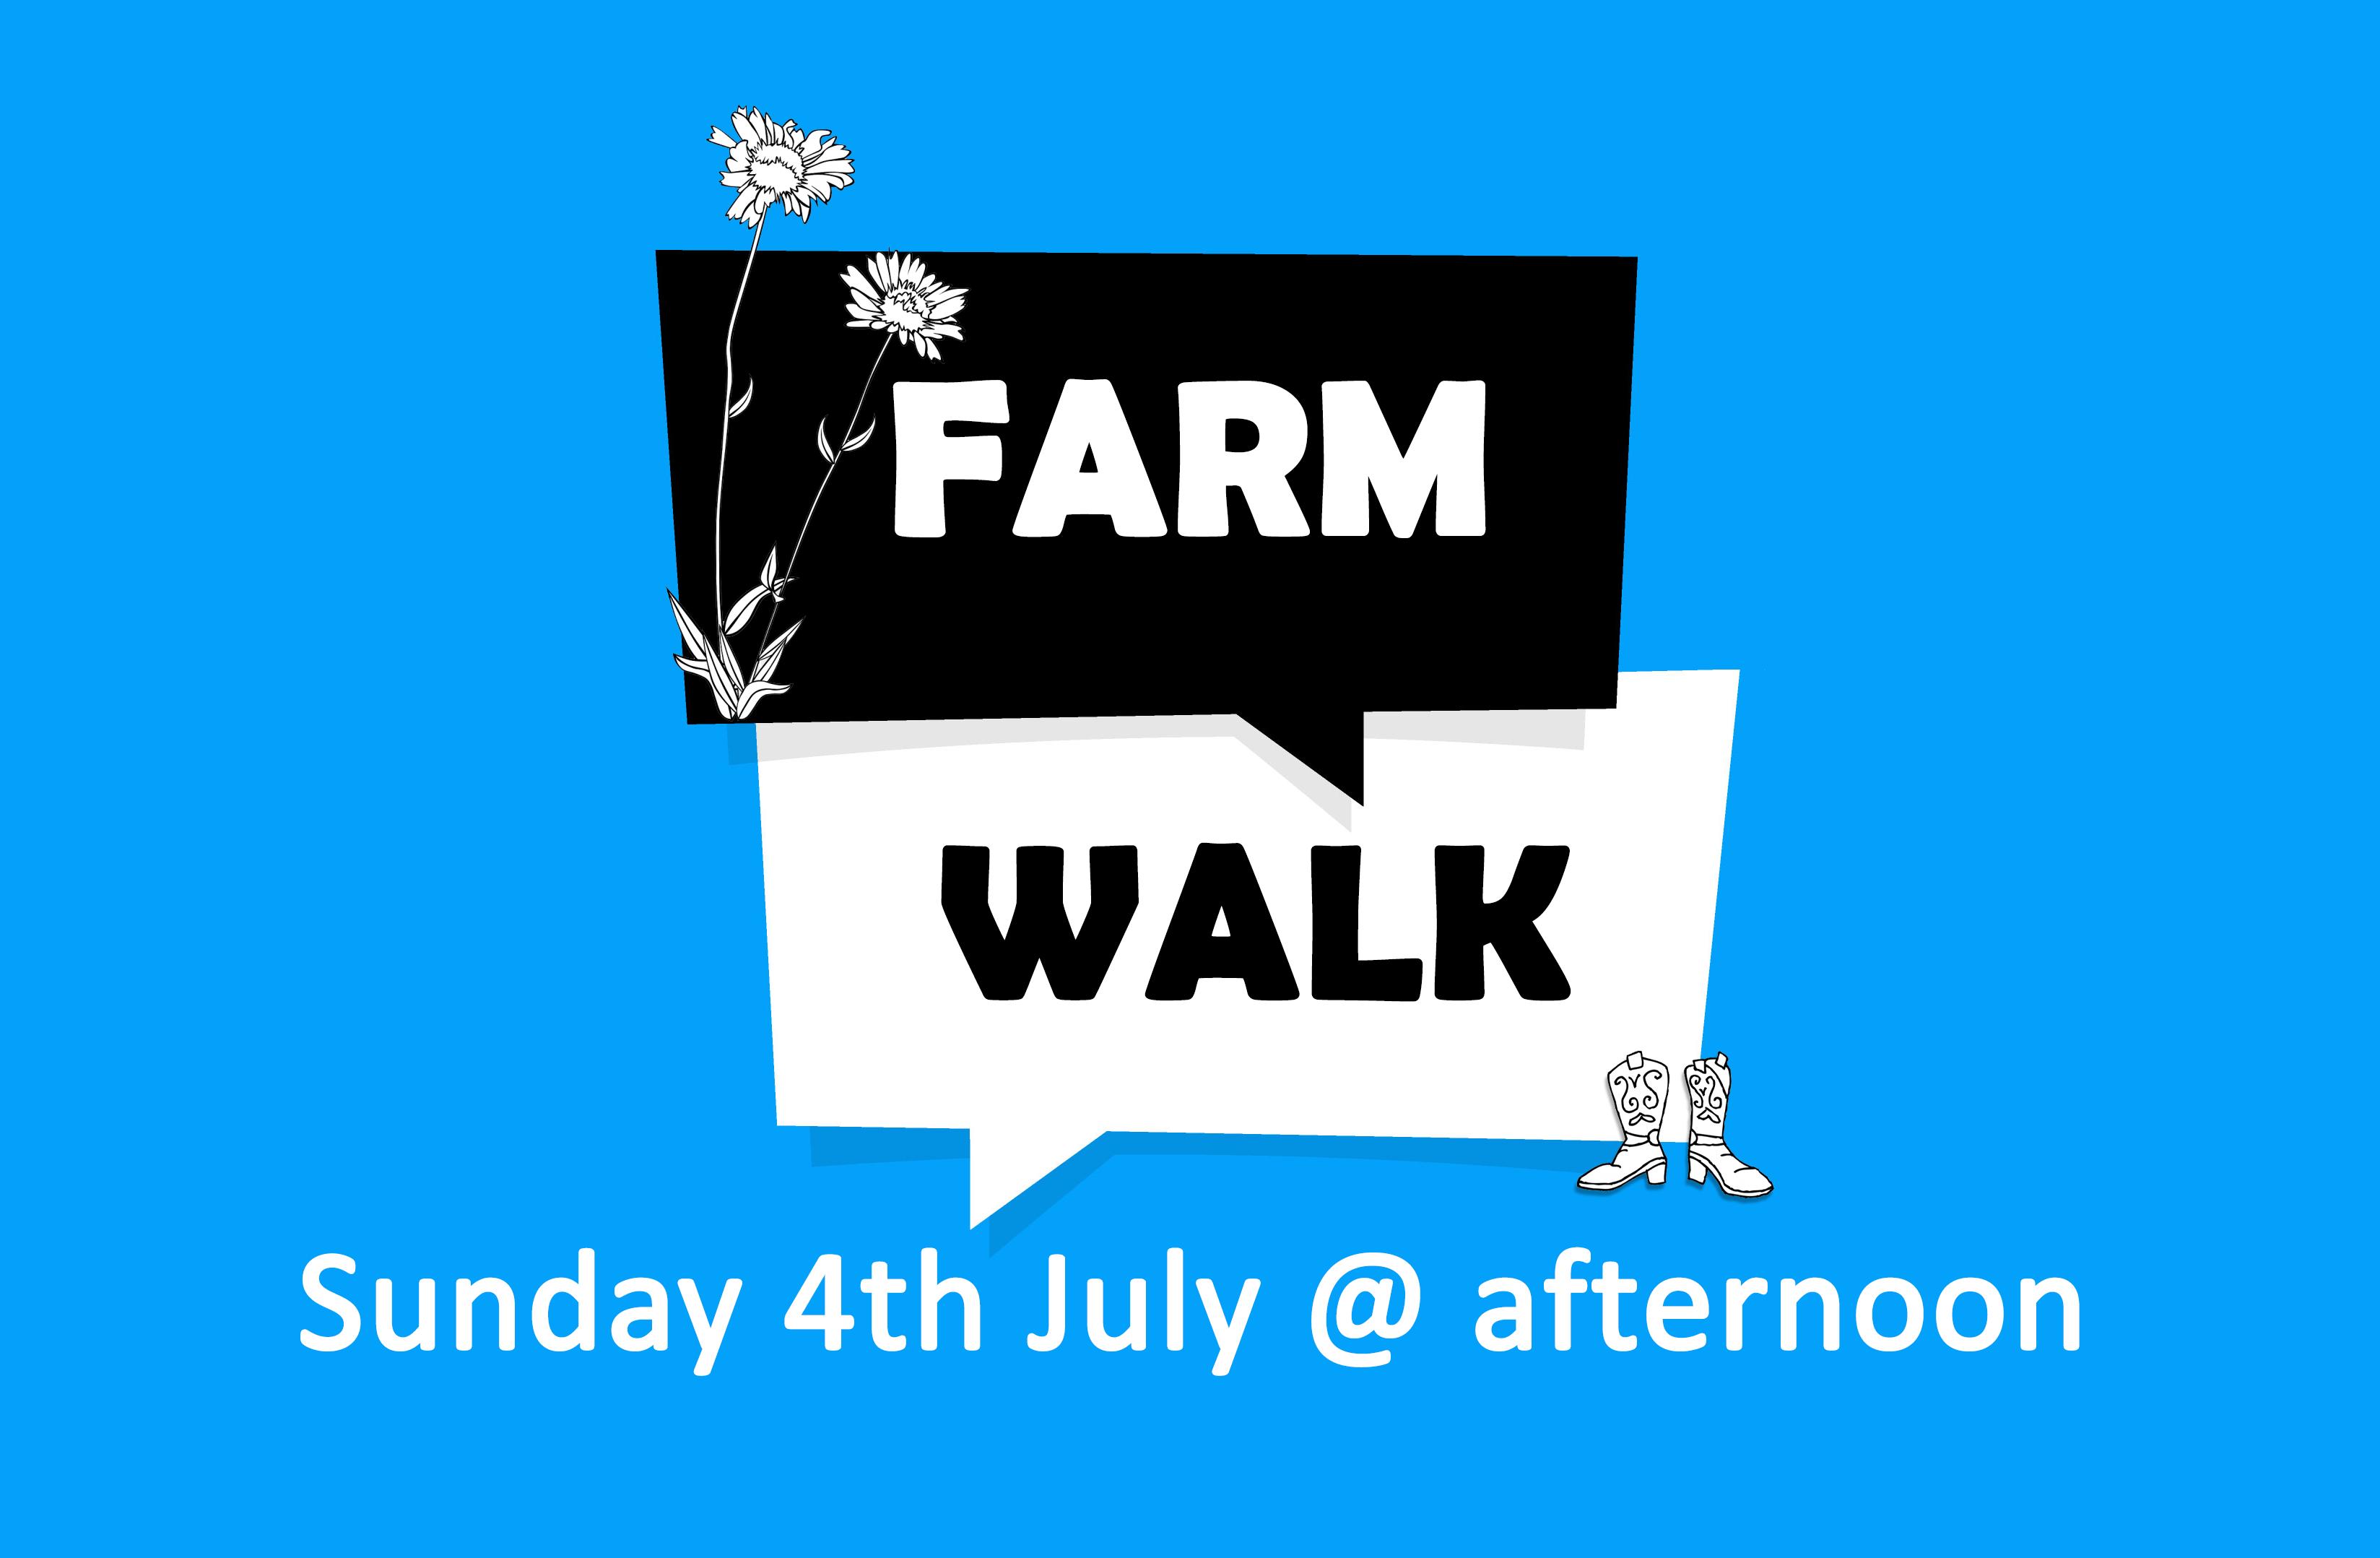 Farm Walk Poster